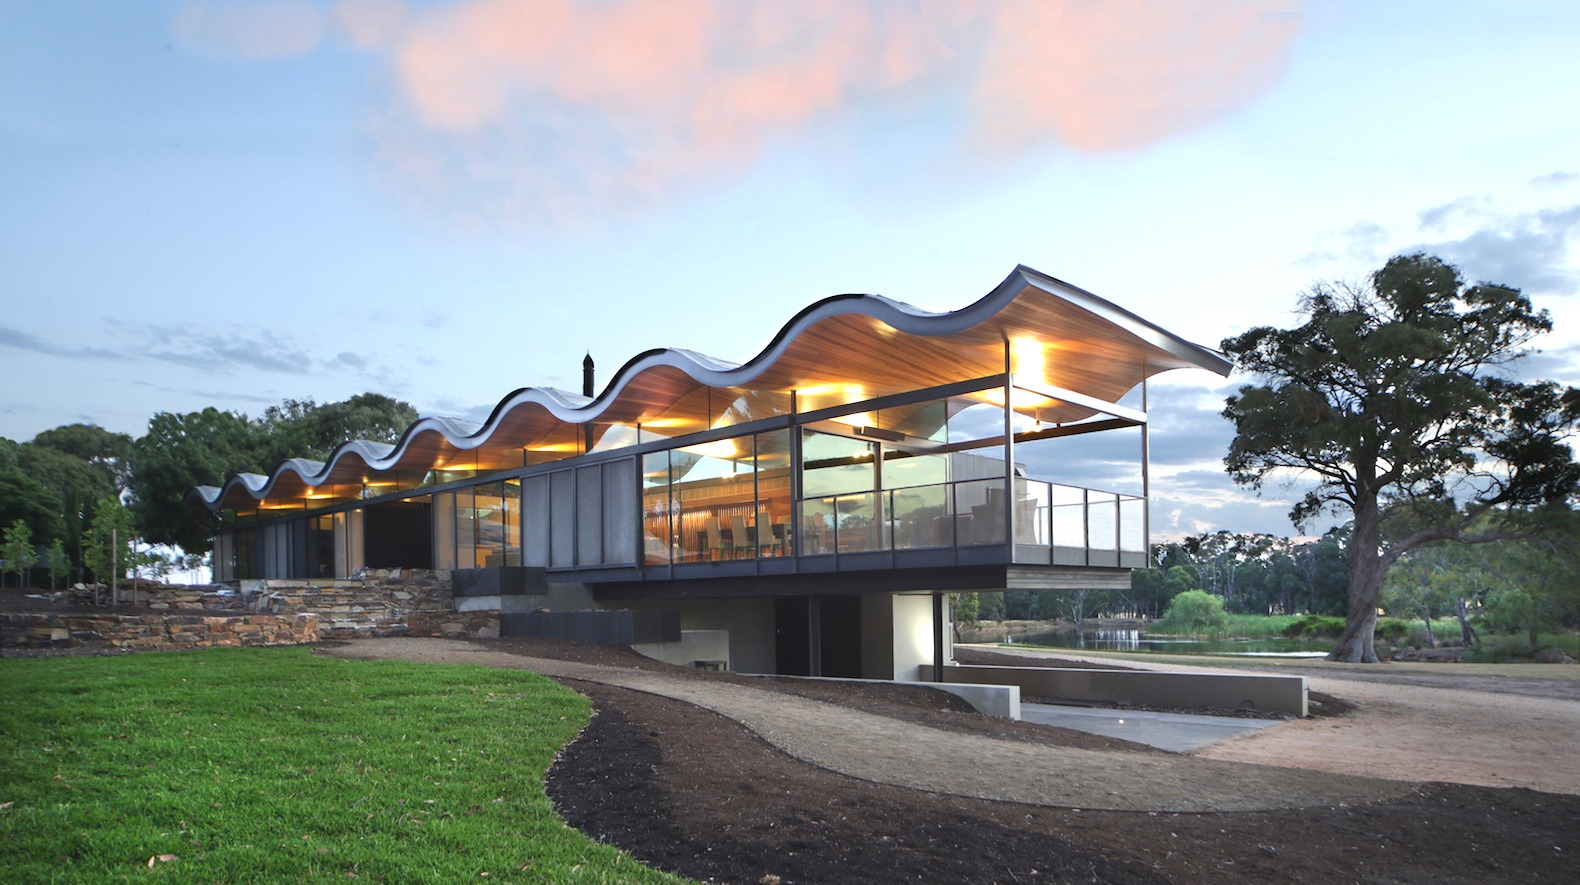 solar panel homes vs passive solar